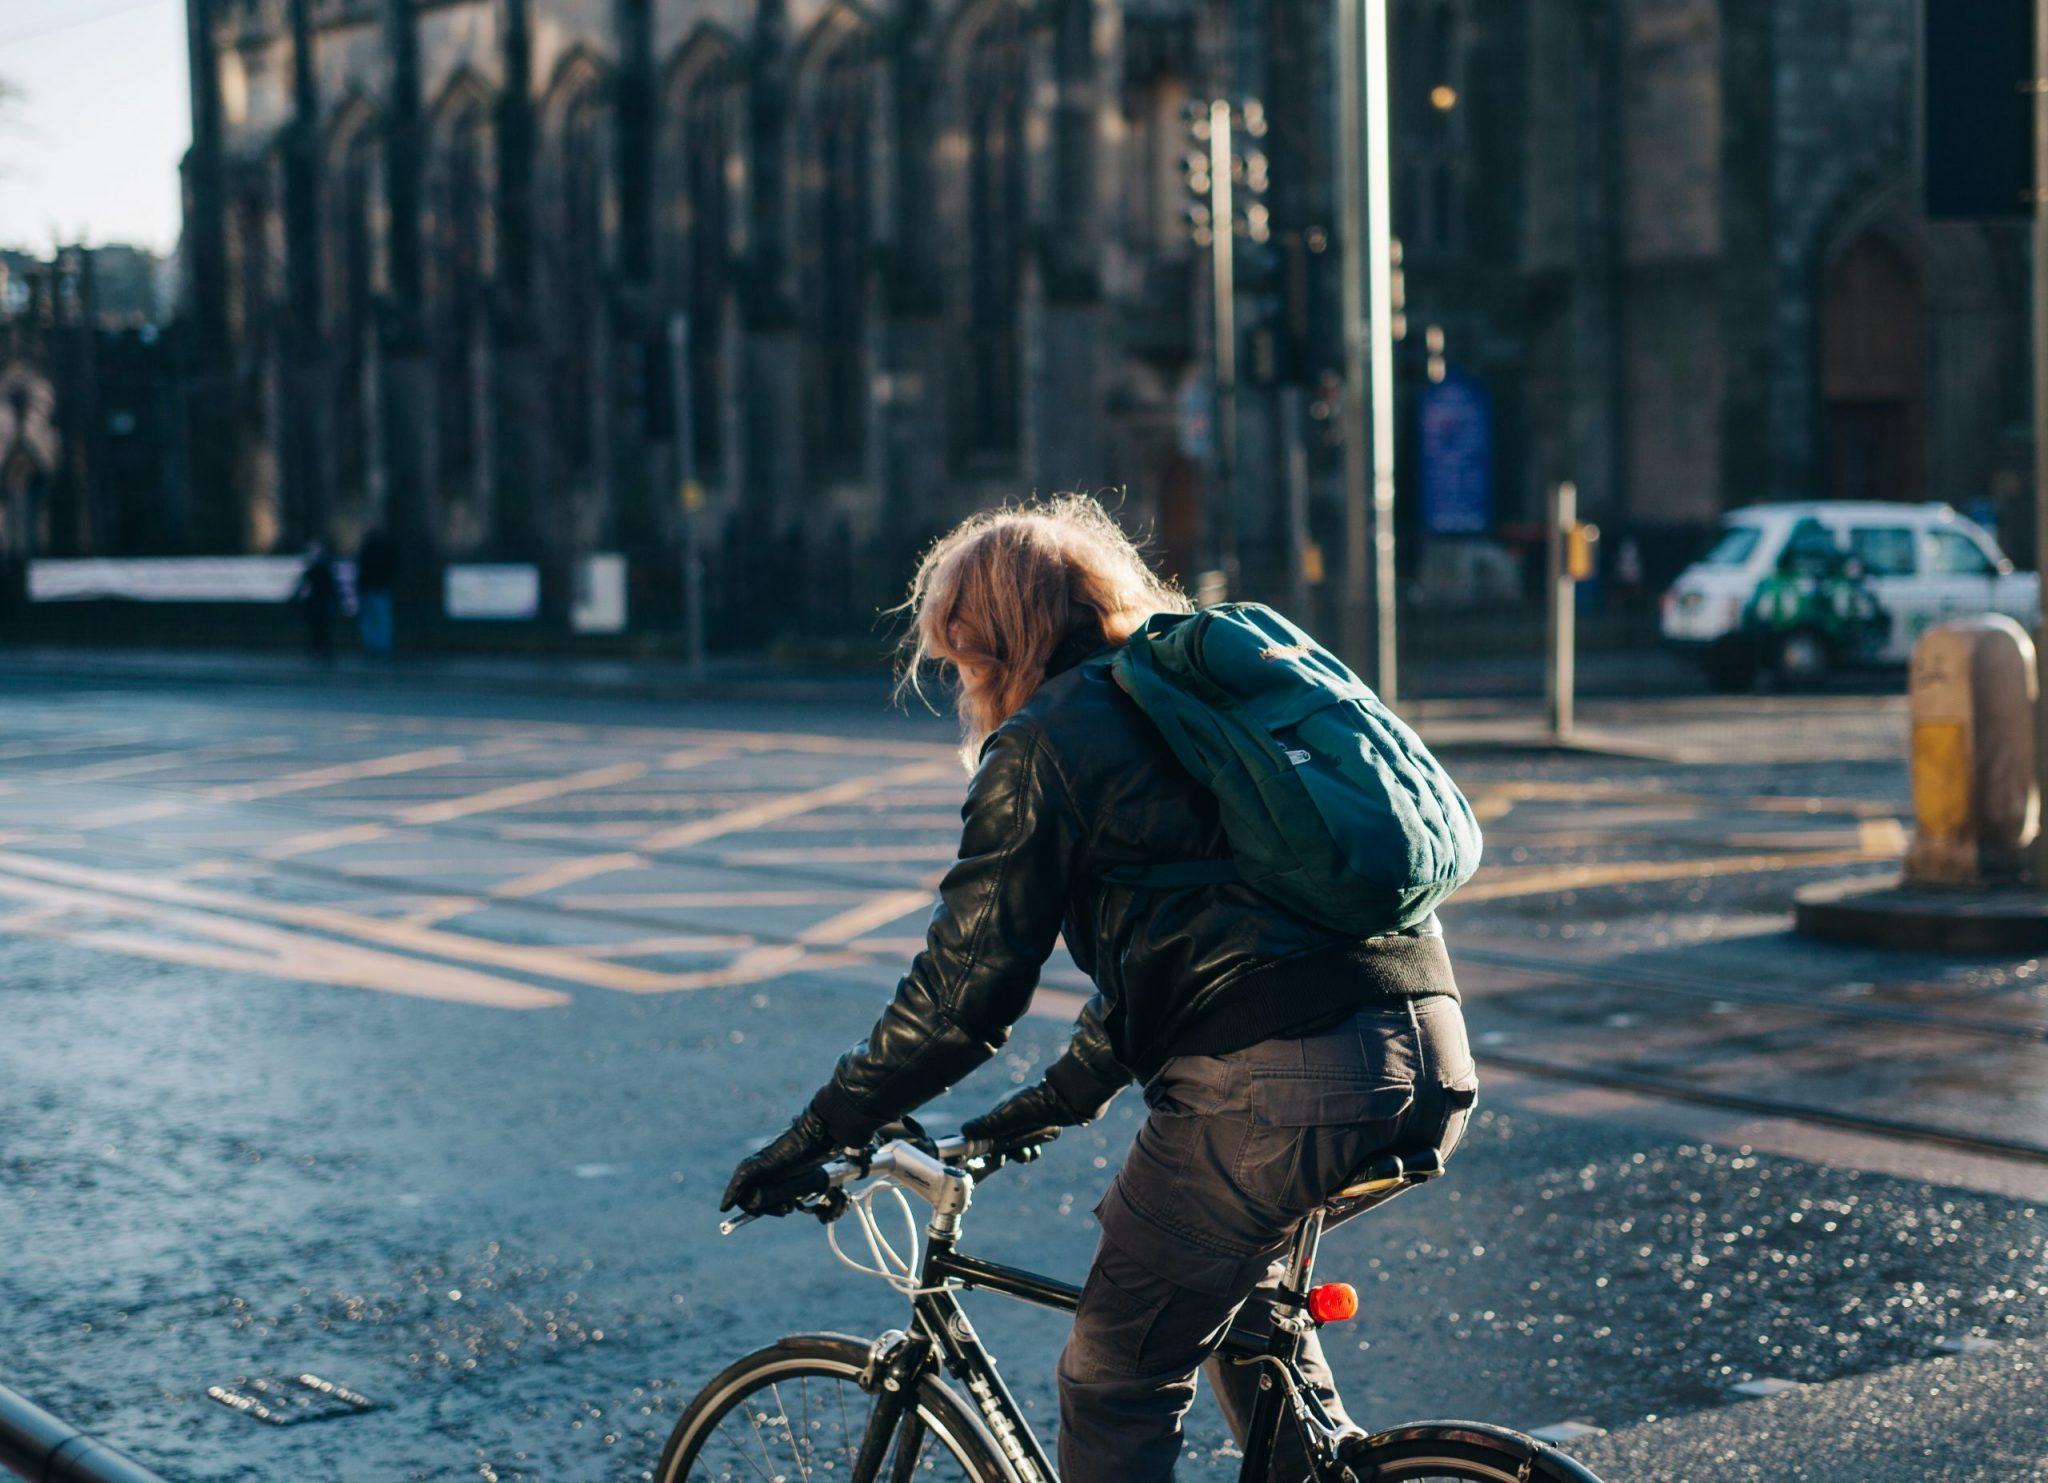 Best Backpack For Commuting On Bike